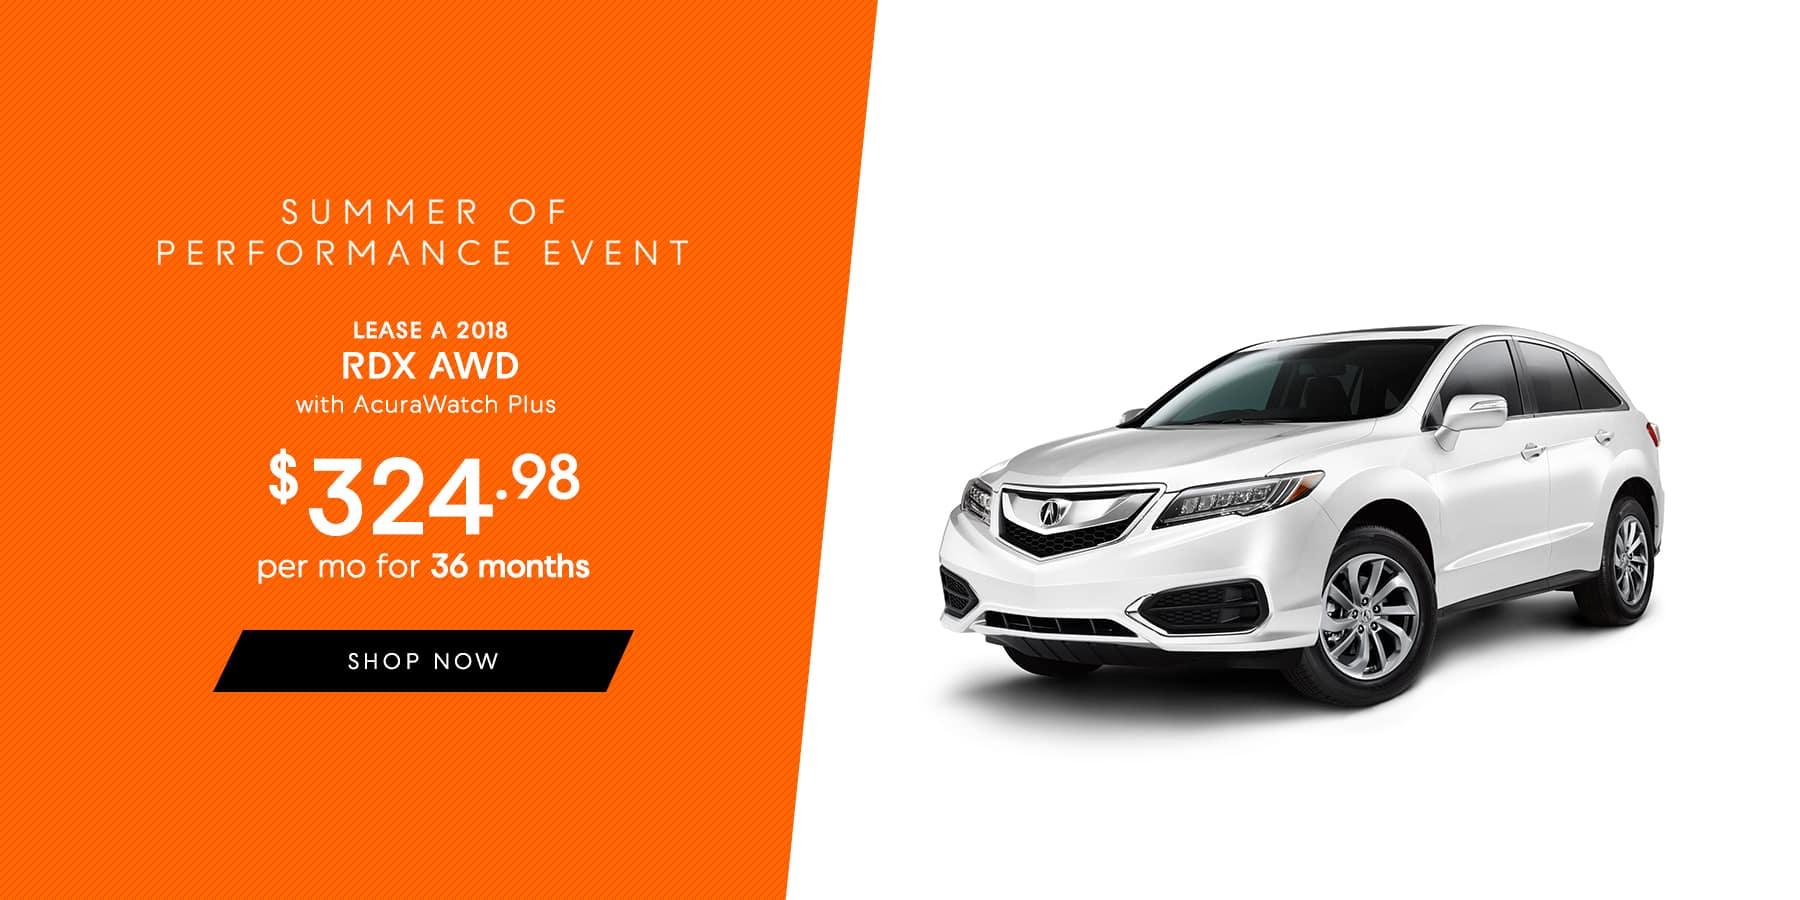 Jeffrey Acura in Roseville, MI | New & Used Acura Dealer on